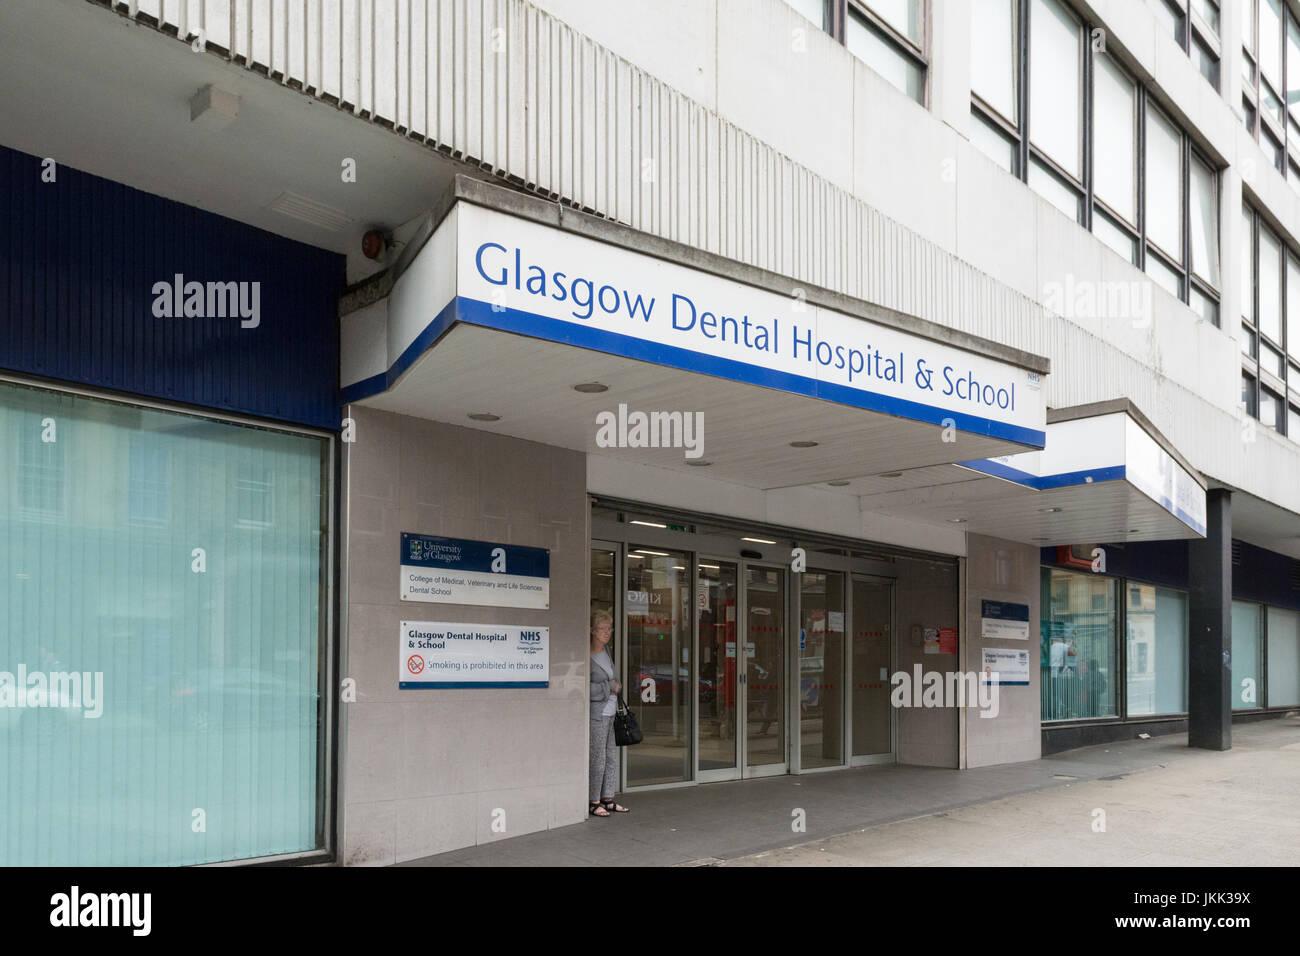 Glasgow Dental Hospital Photo Stock